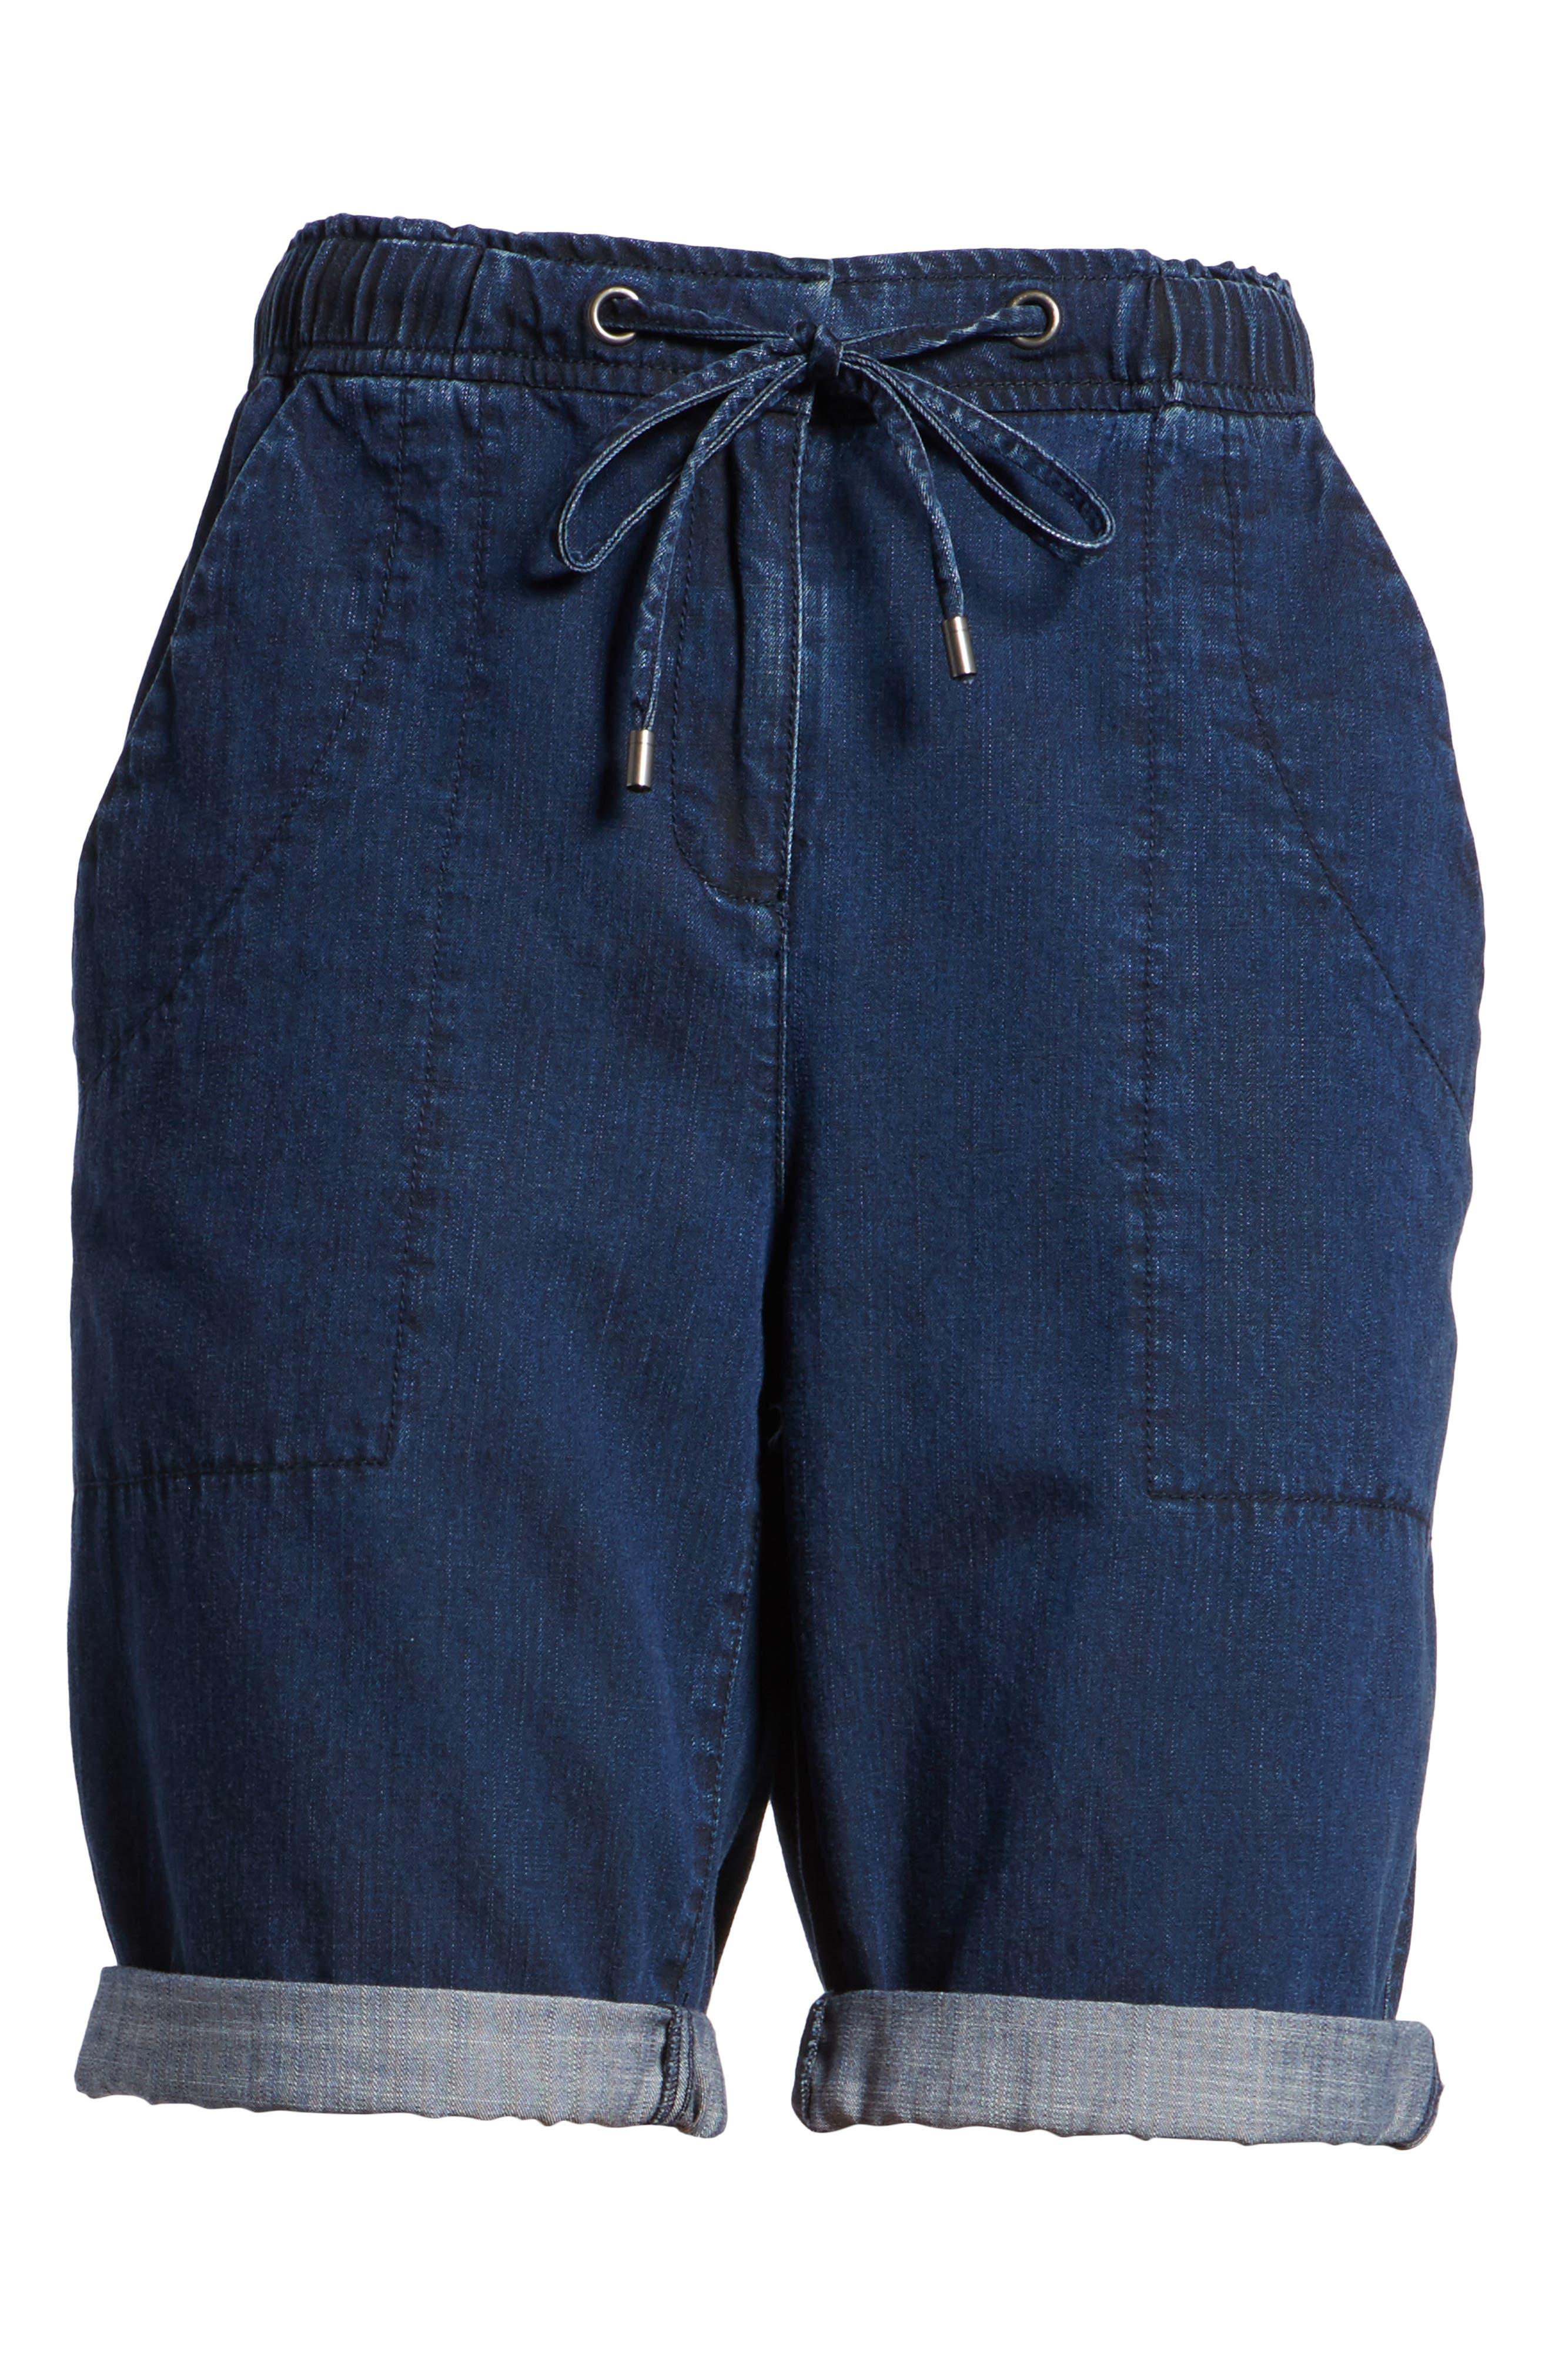 Tencel<sup>®</sup> Lyocell & Organic Cotton Walking Shorts,                             Alternate thumbnail 6, color,                             419